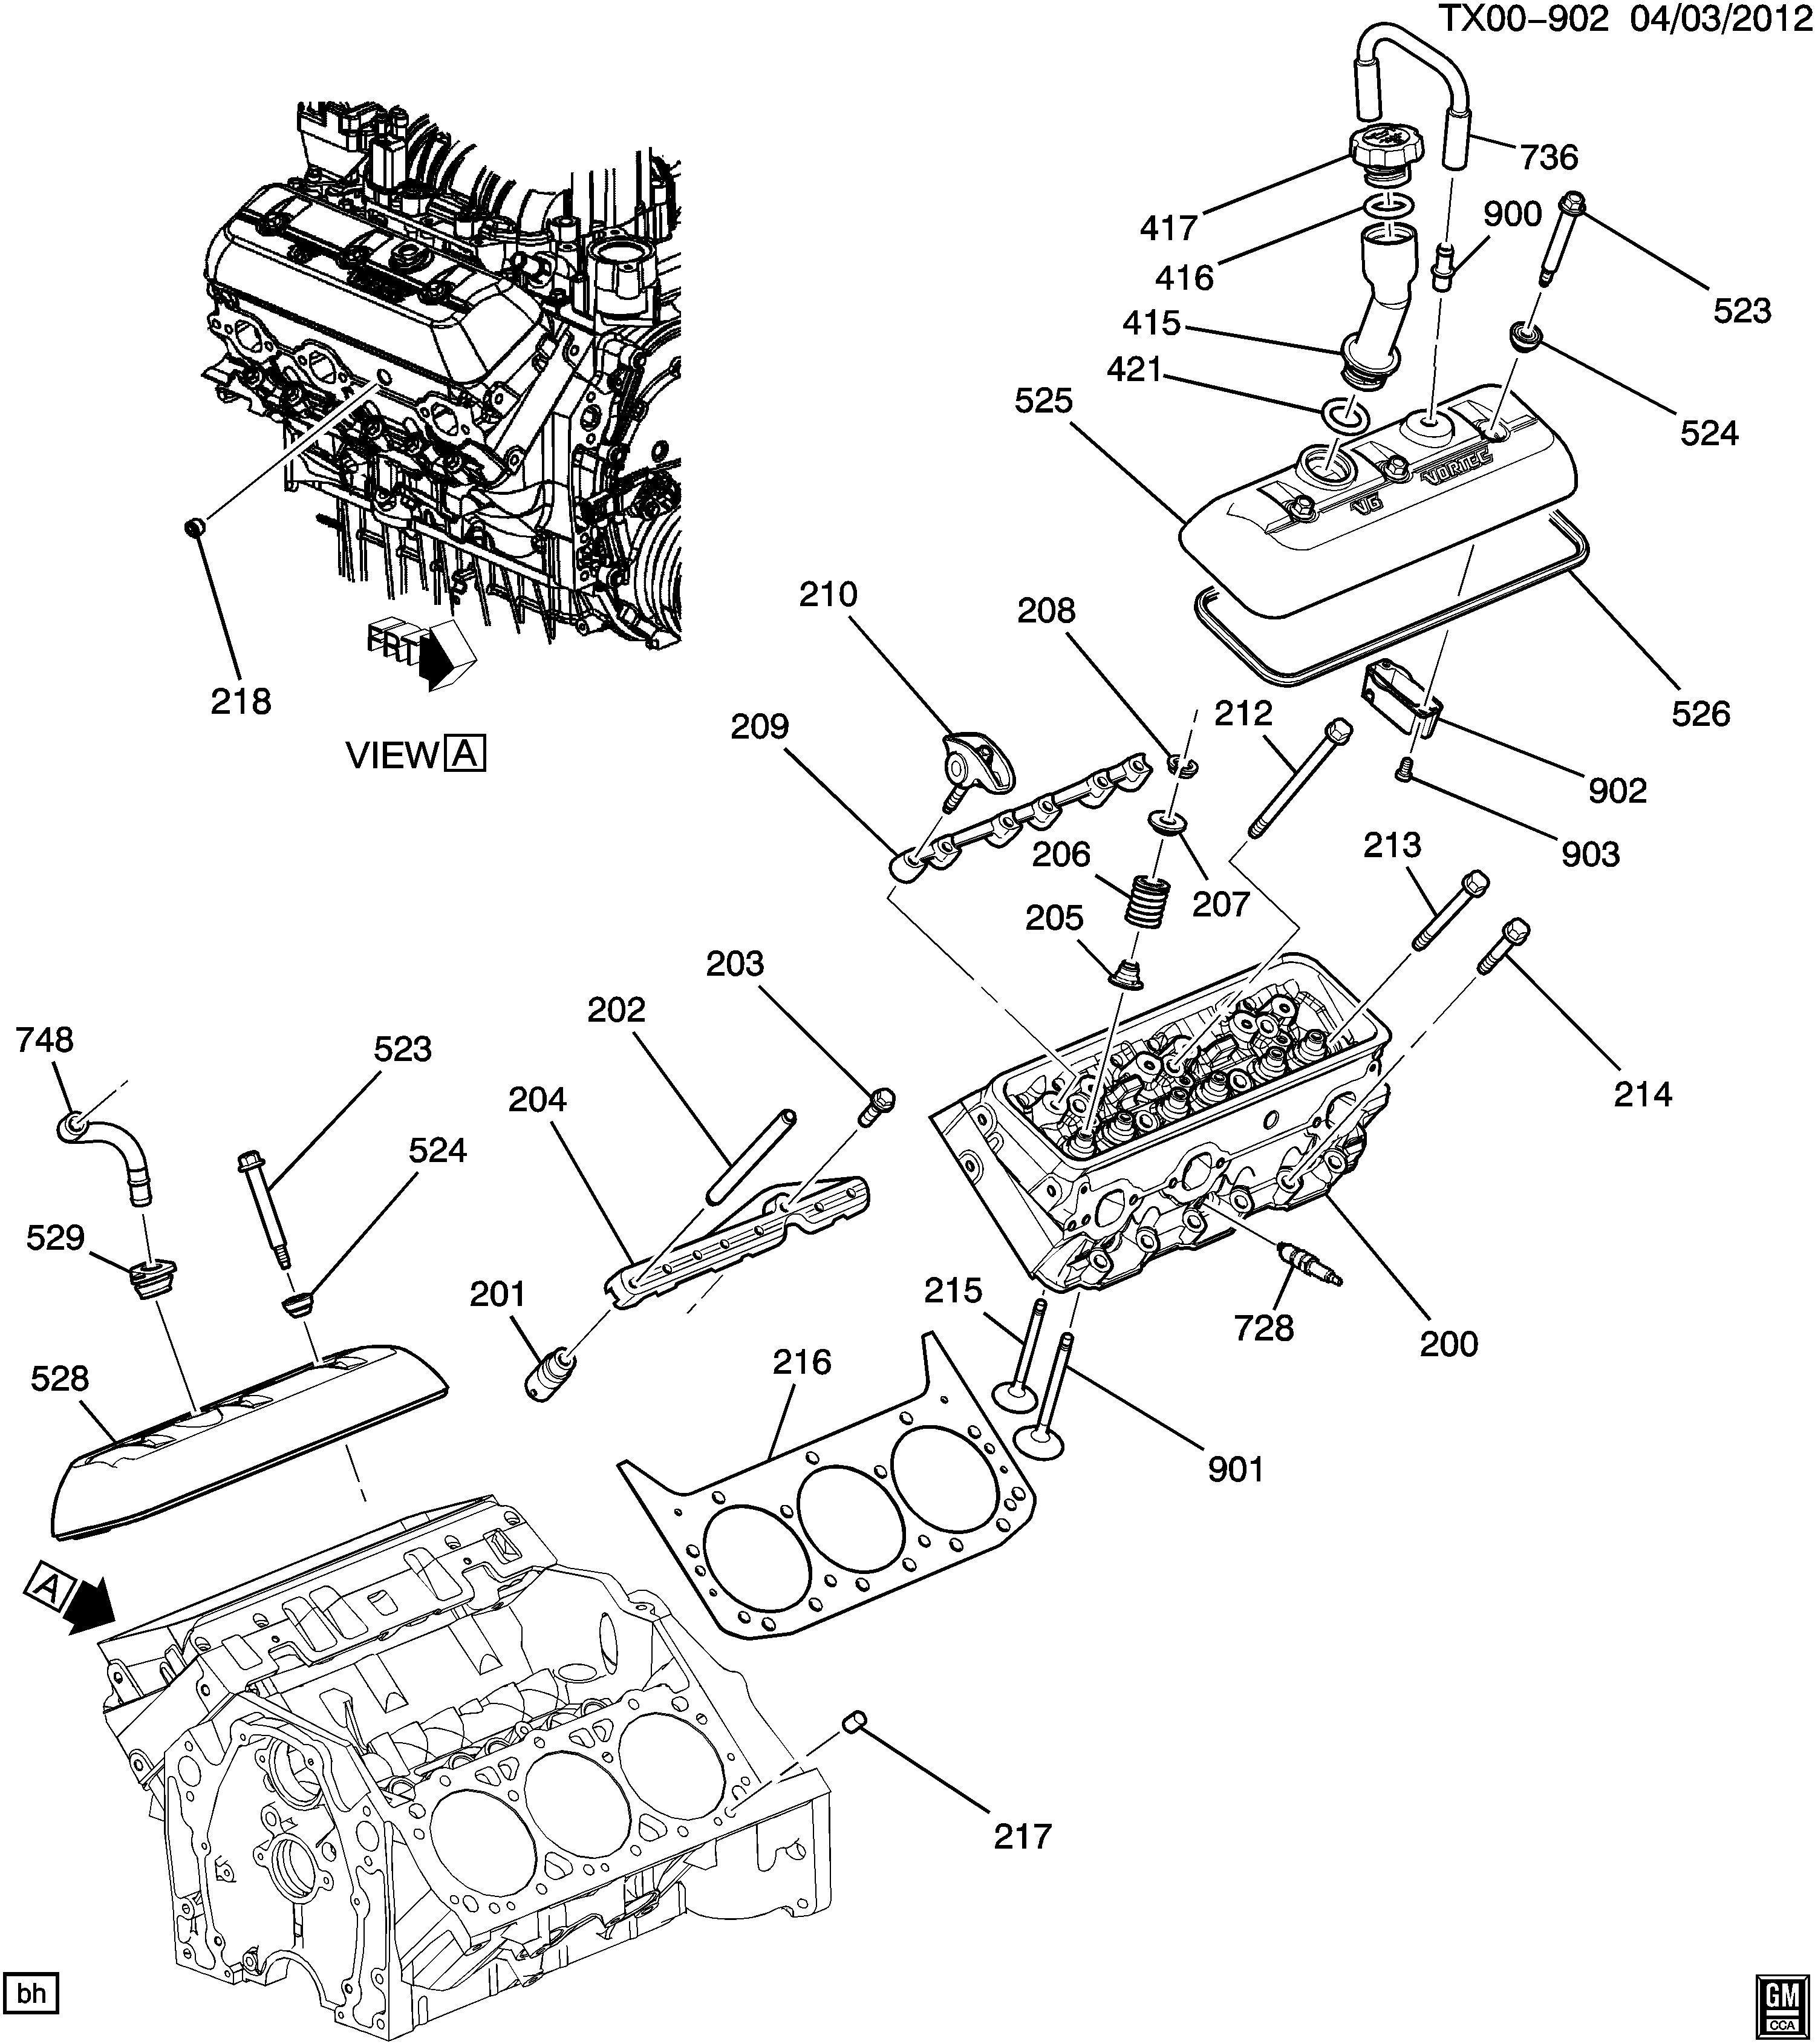 Cadillac Escalade Fitting Engine Crankcase Ventilation